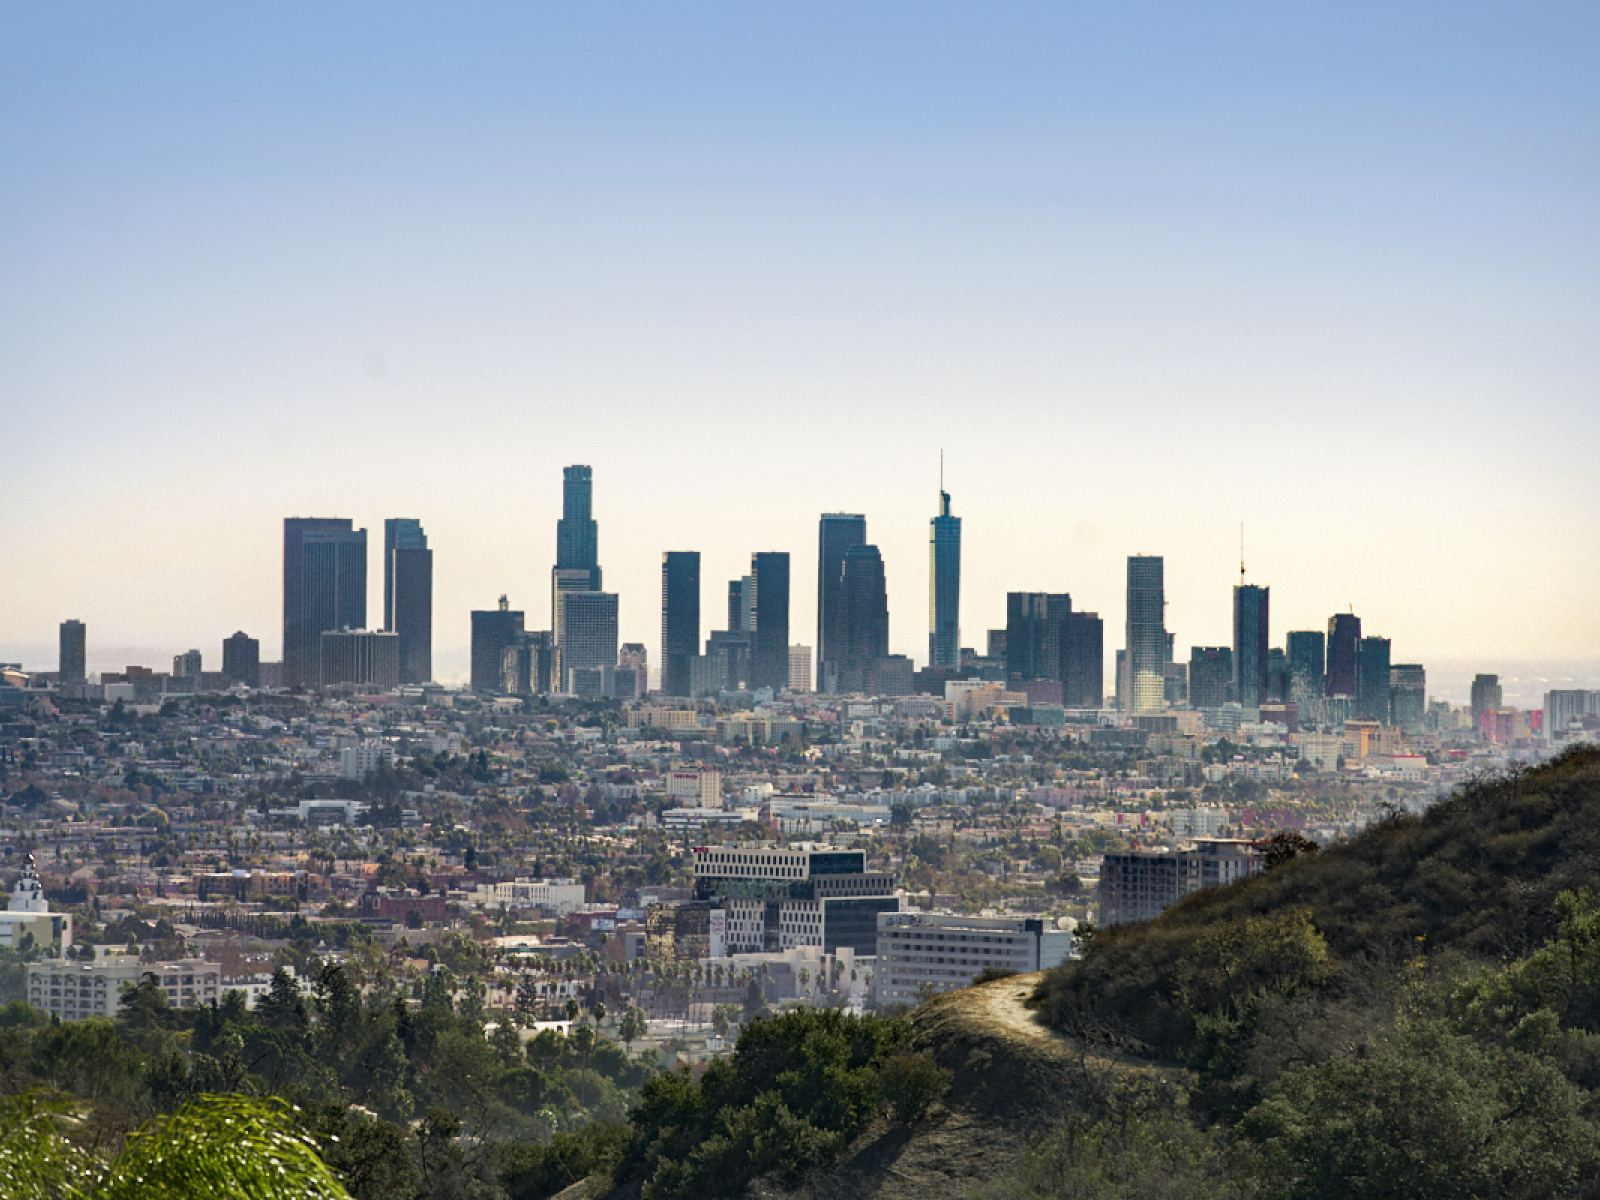 Los Angeles hotels volunteer 30,000 rooms to LA COVID-19 response